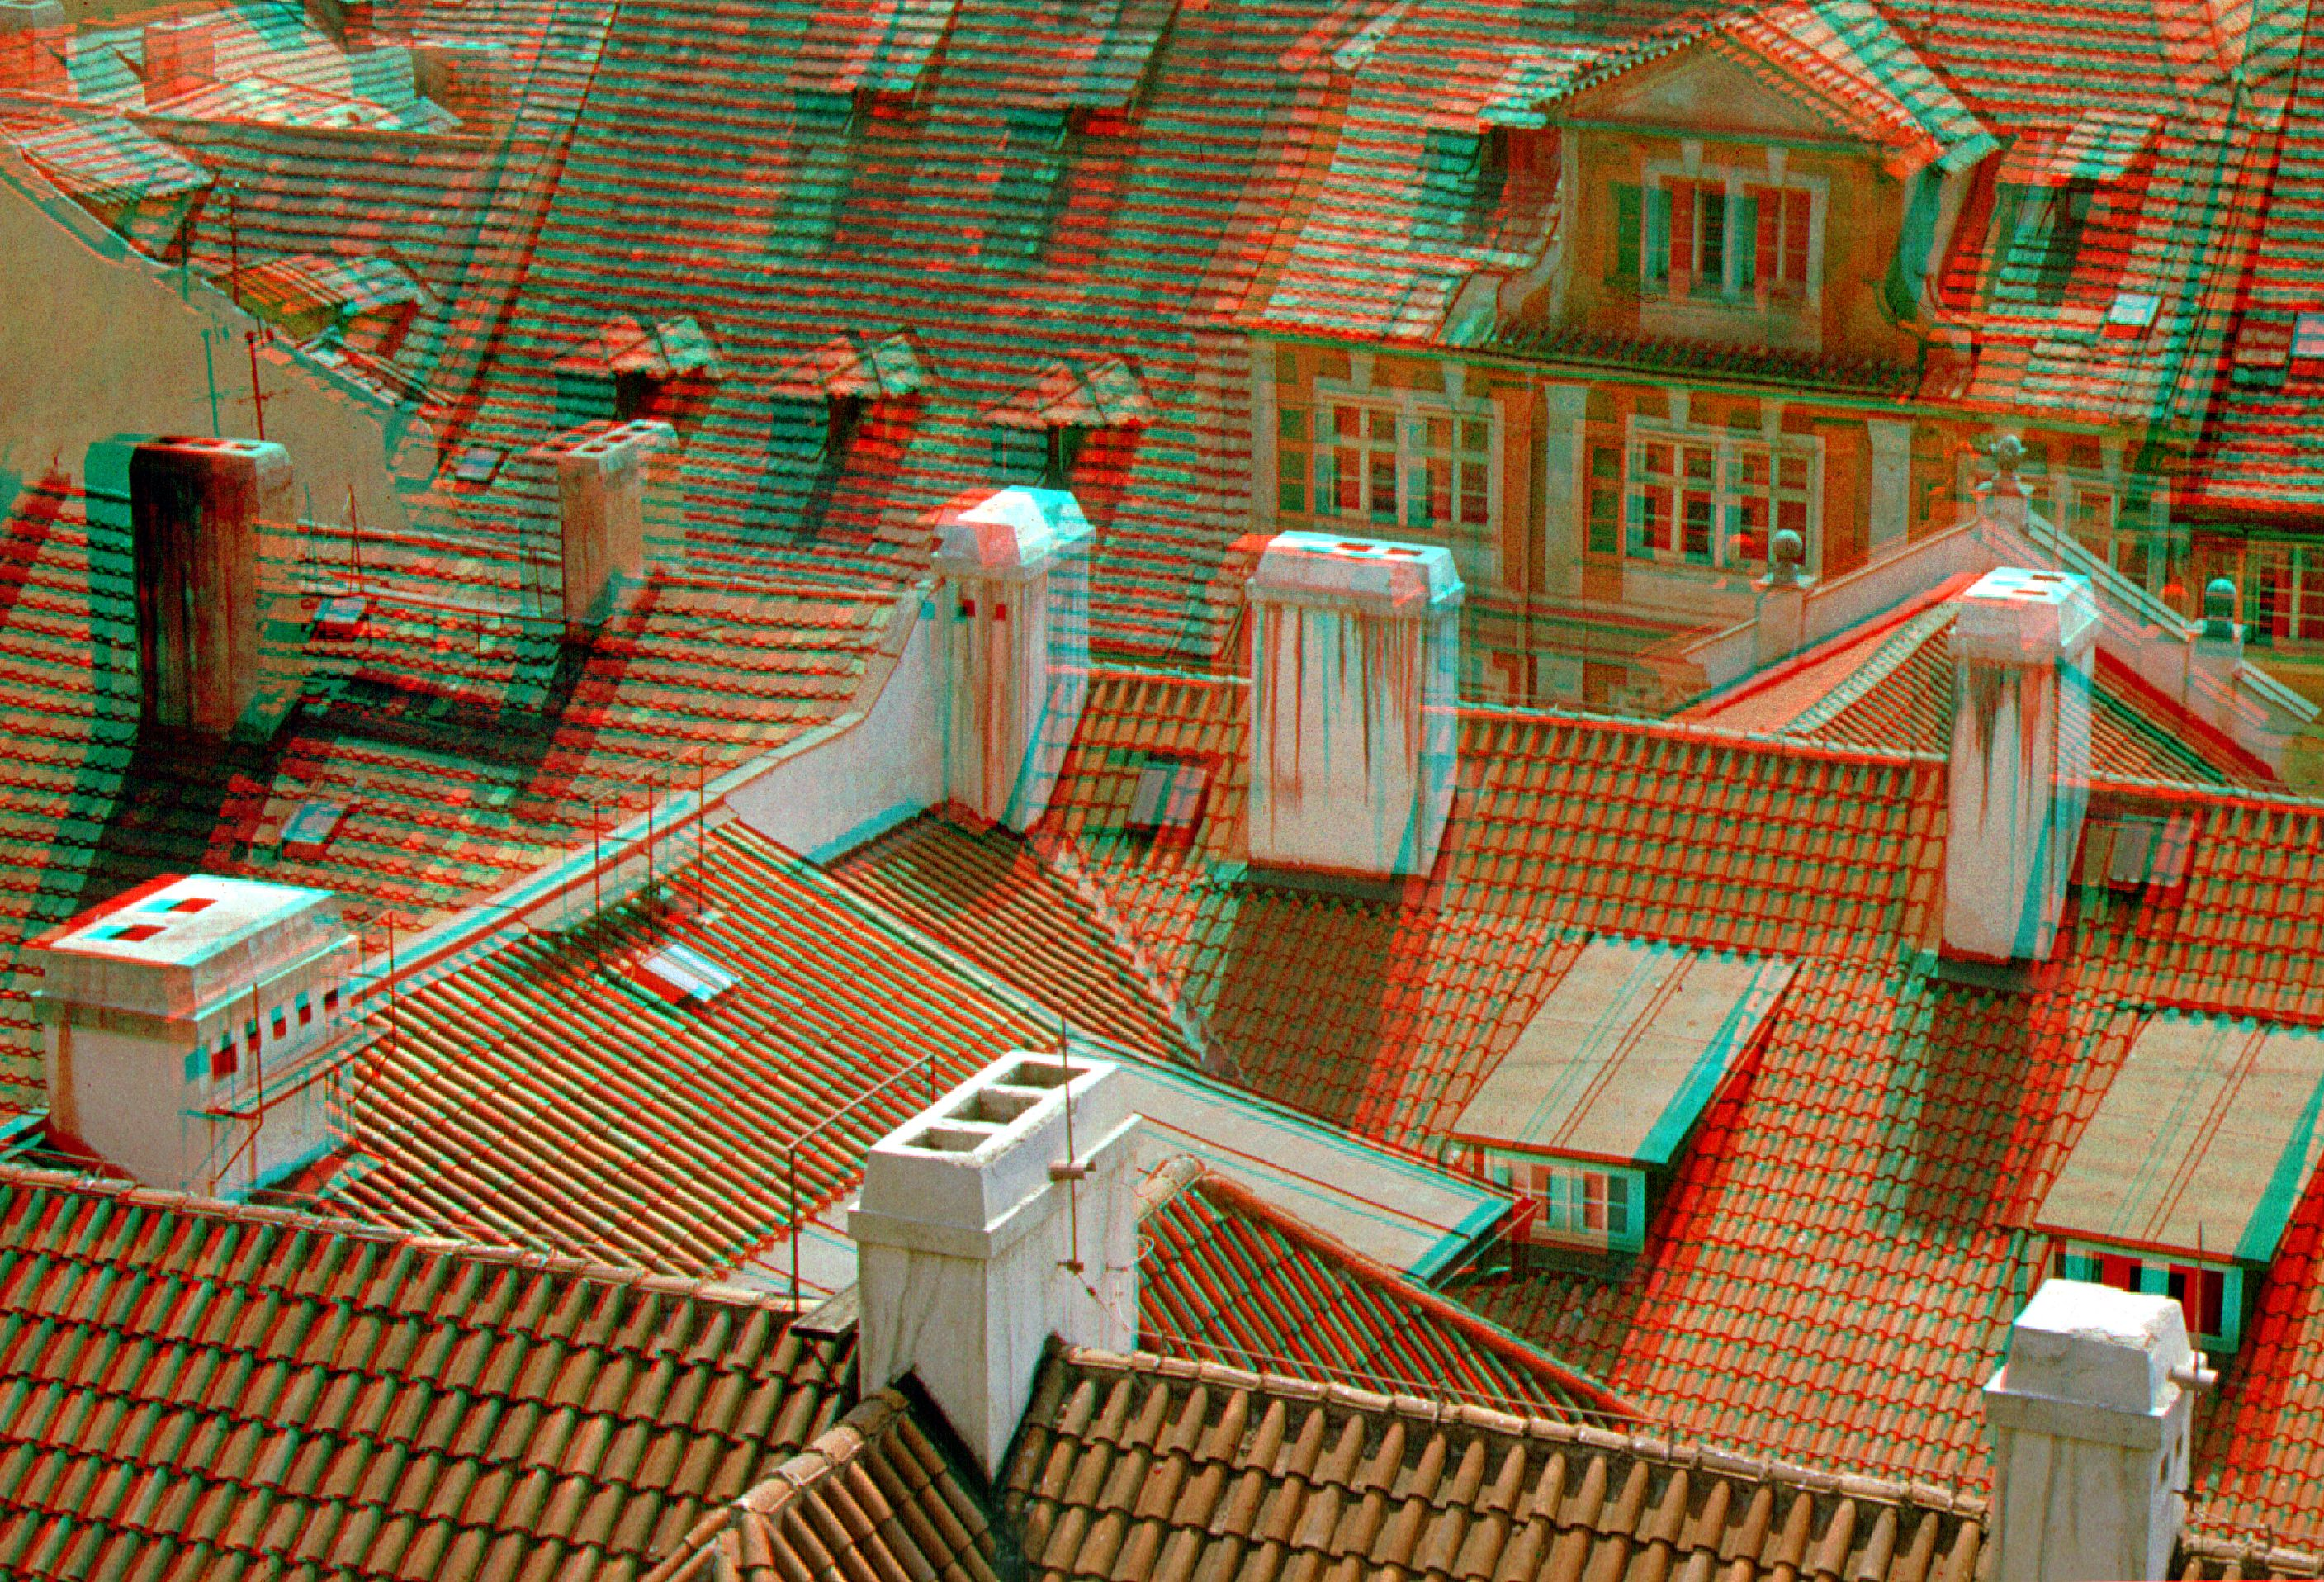 File:Old Prague roofs anaglyph.jpg